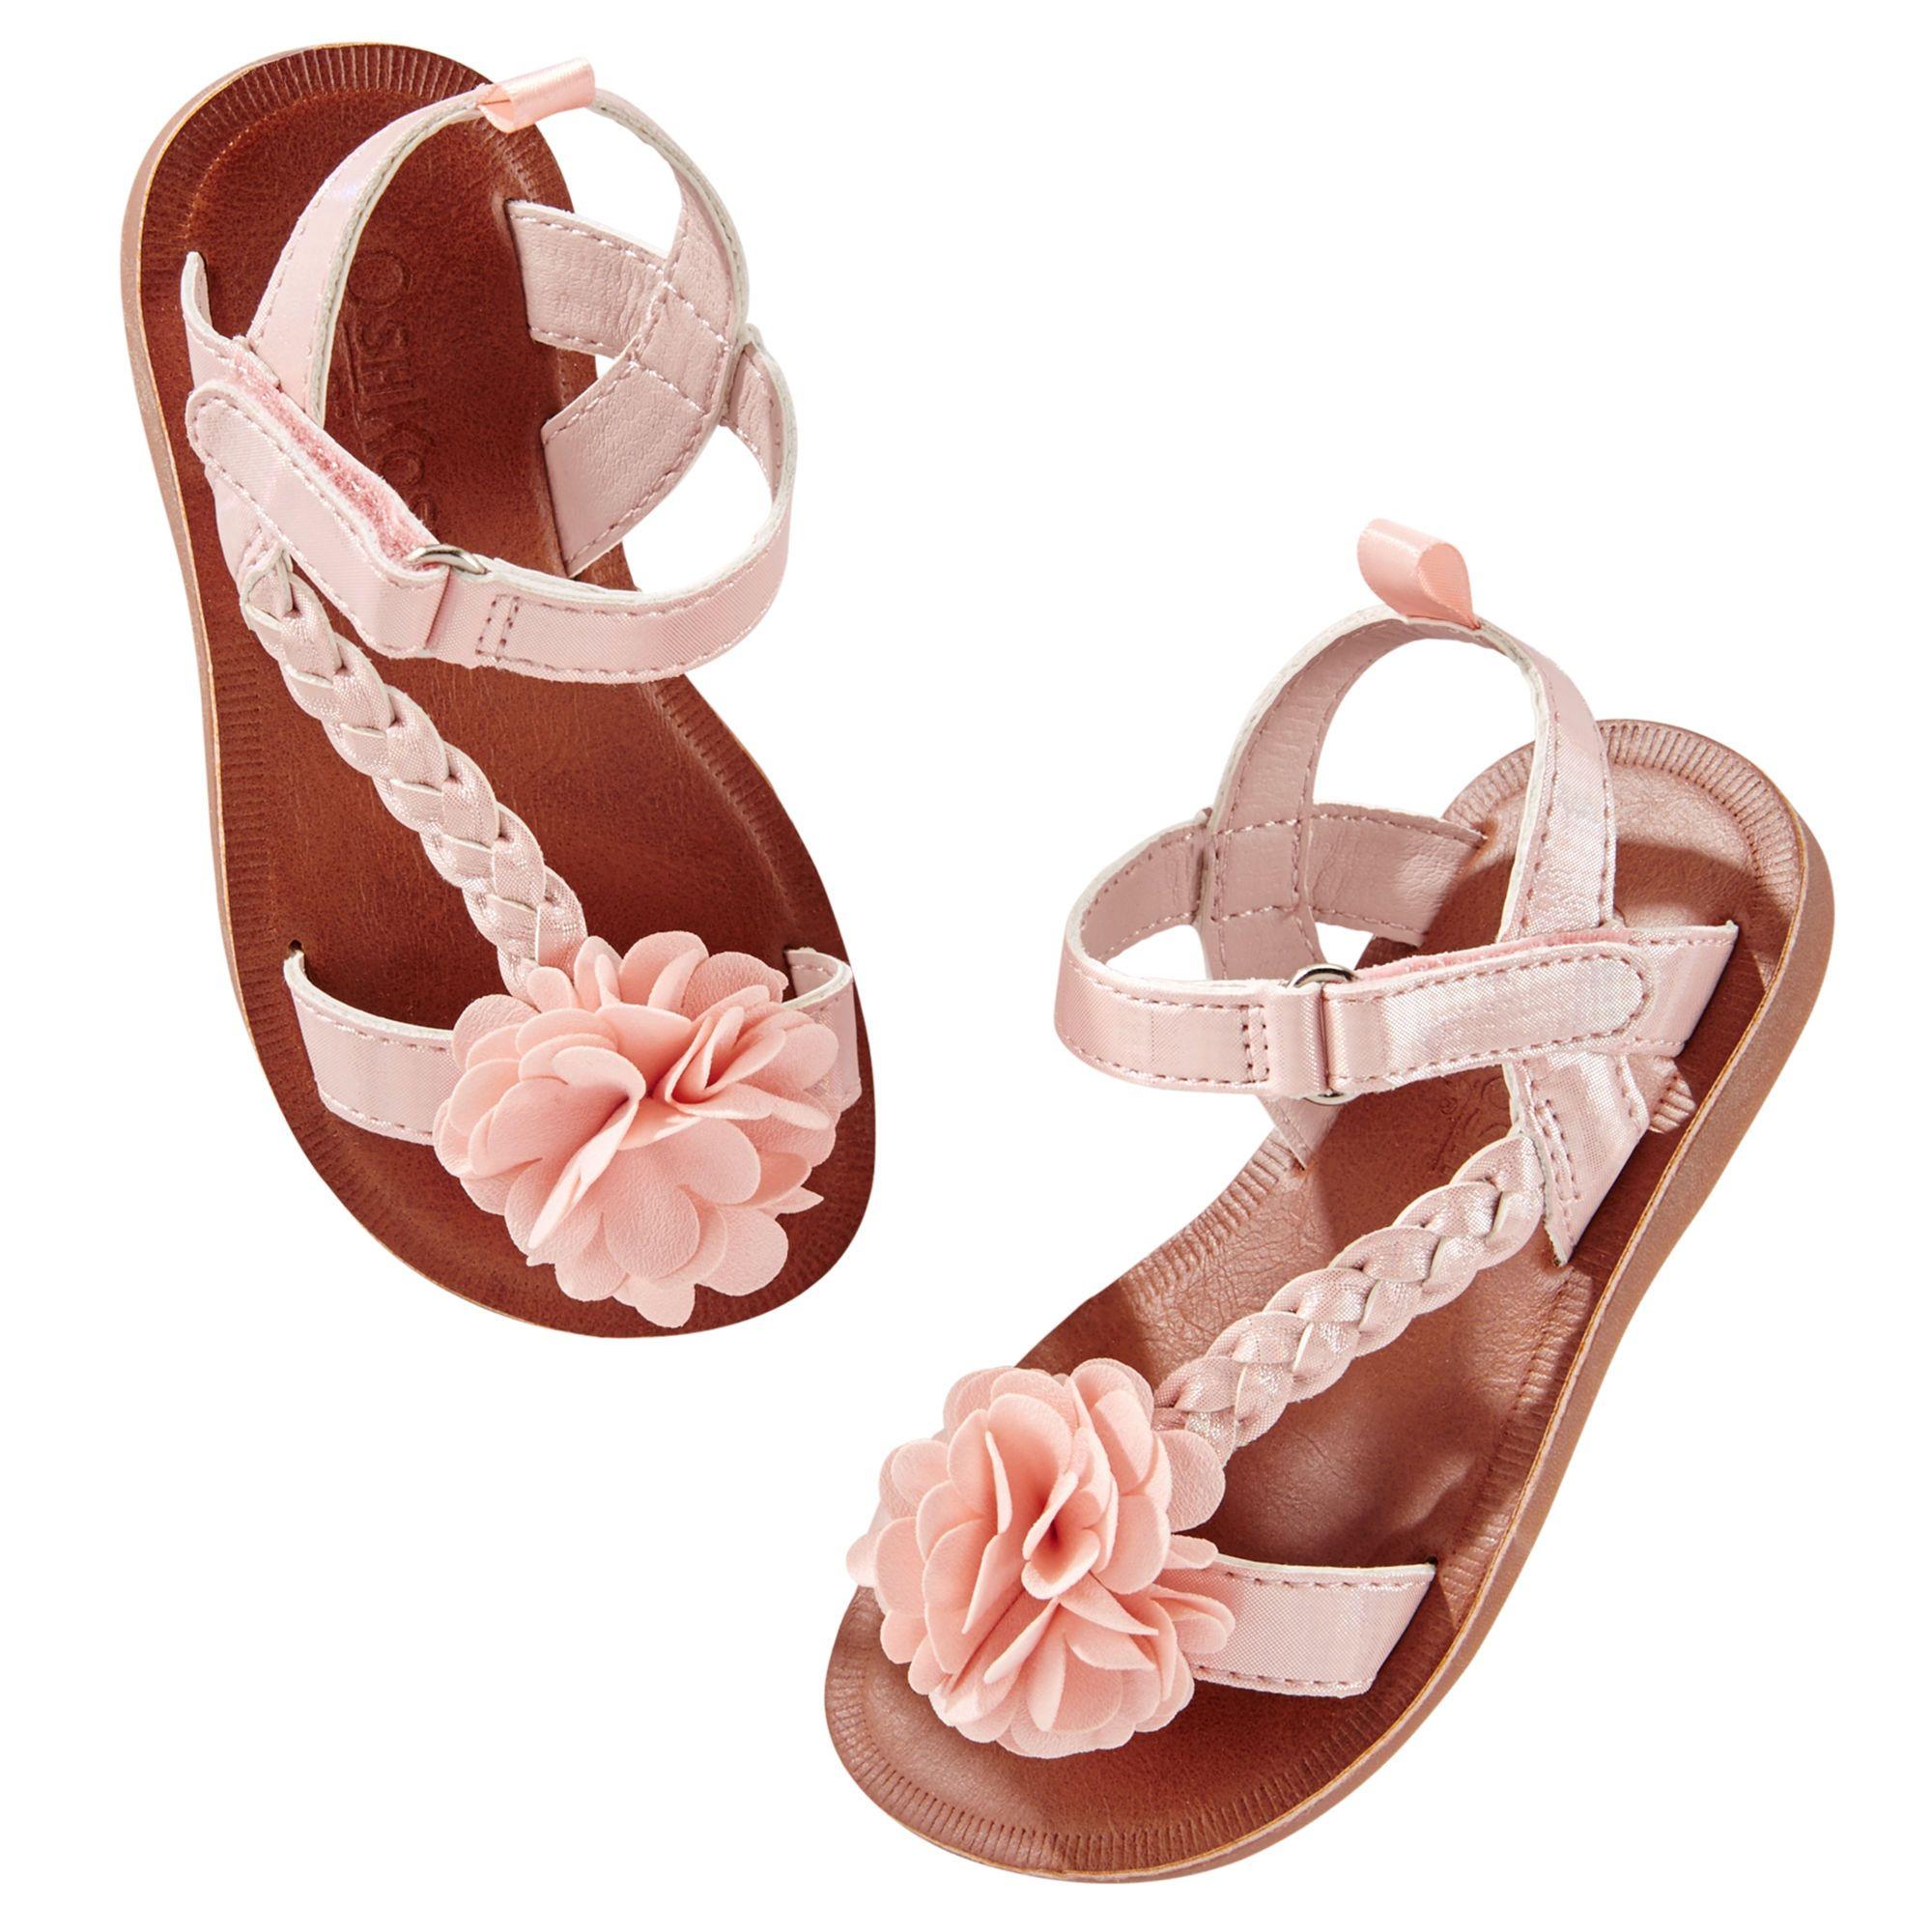 babies shoes and crib pin toms pink baby oshkosh cribs bow girl com